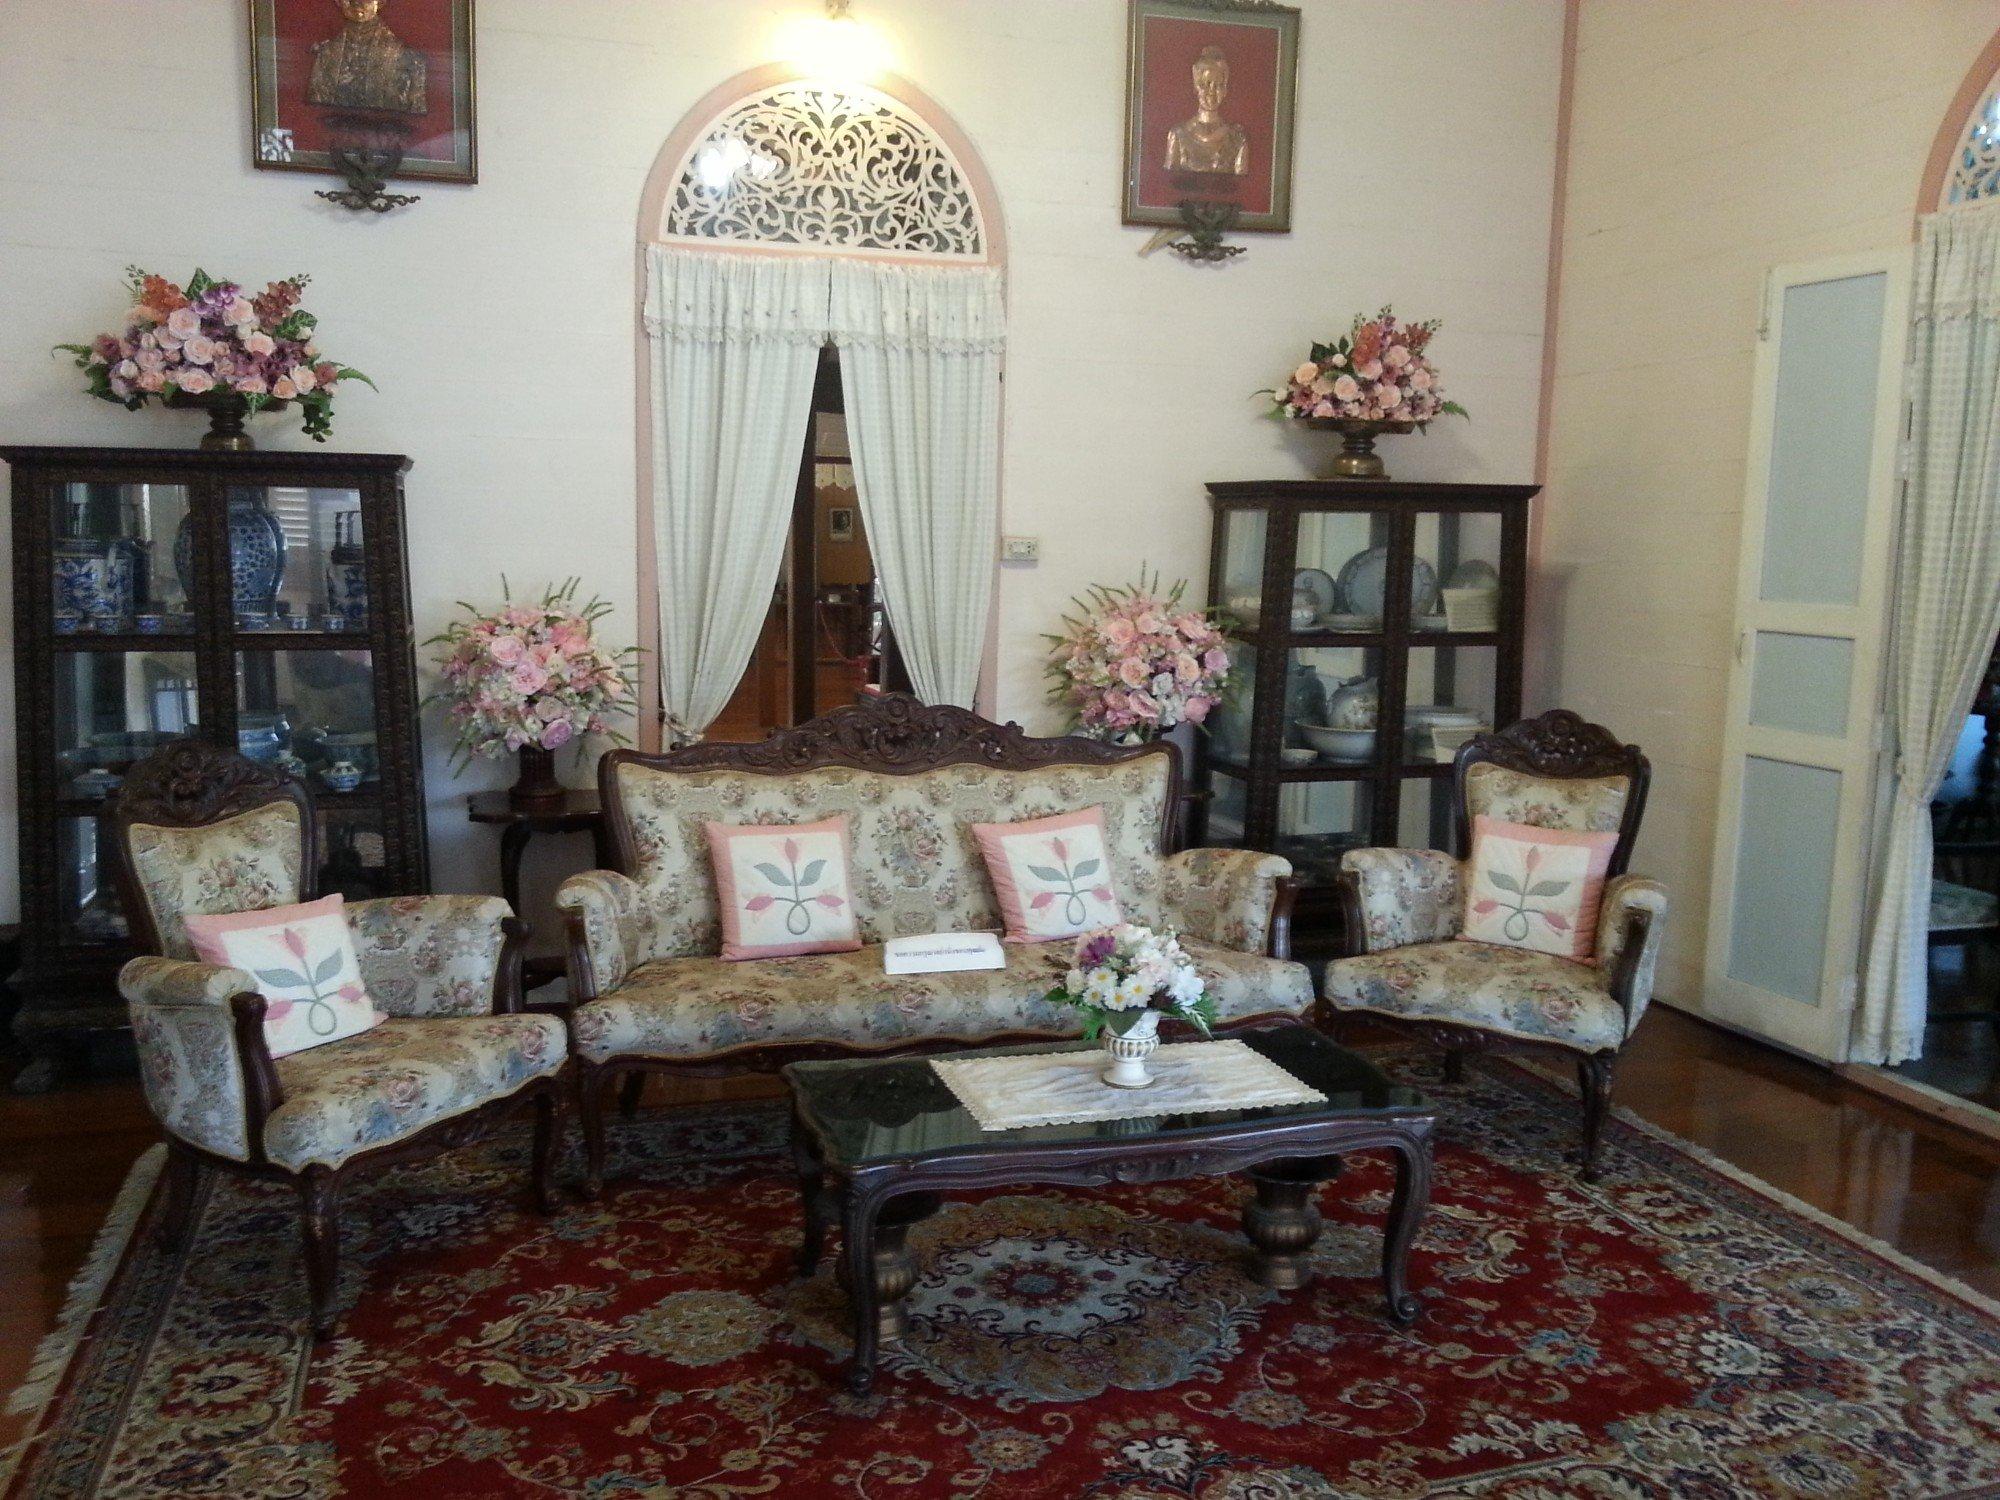 Sitting room at the Vongburi House Museum